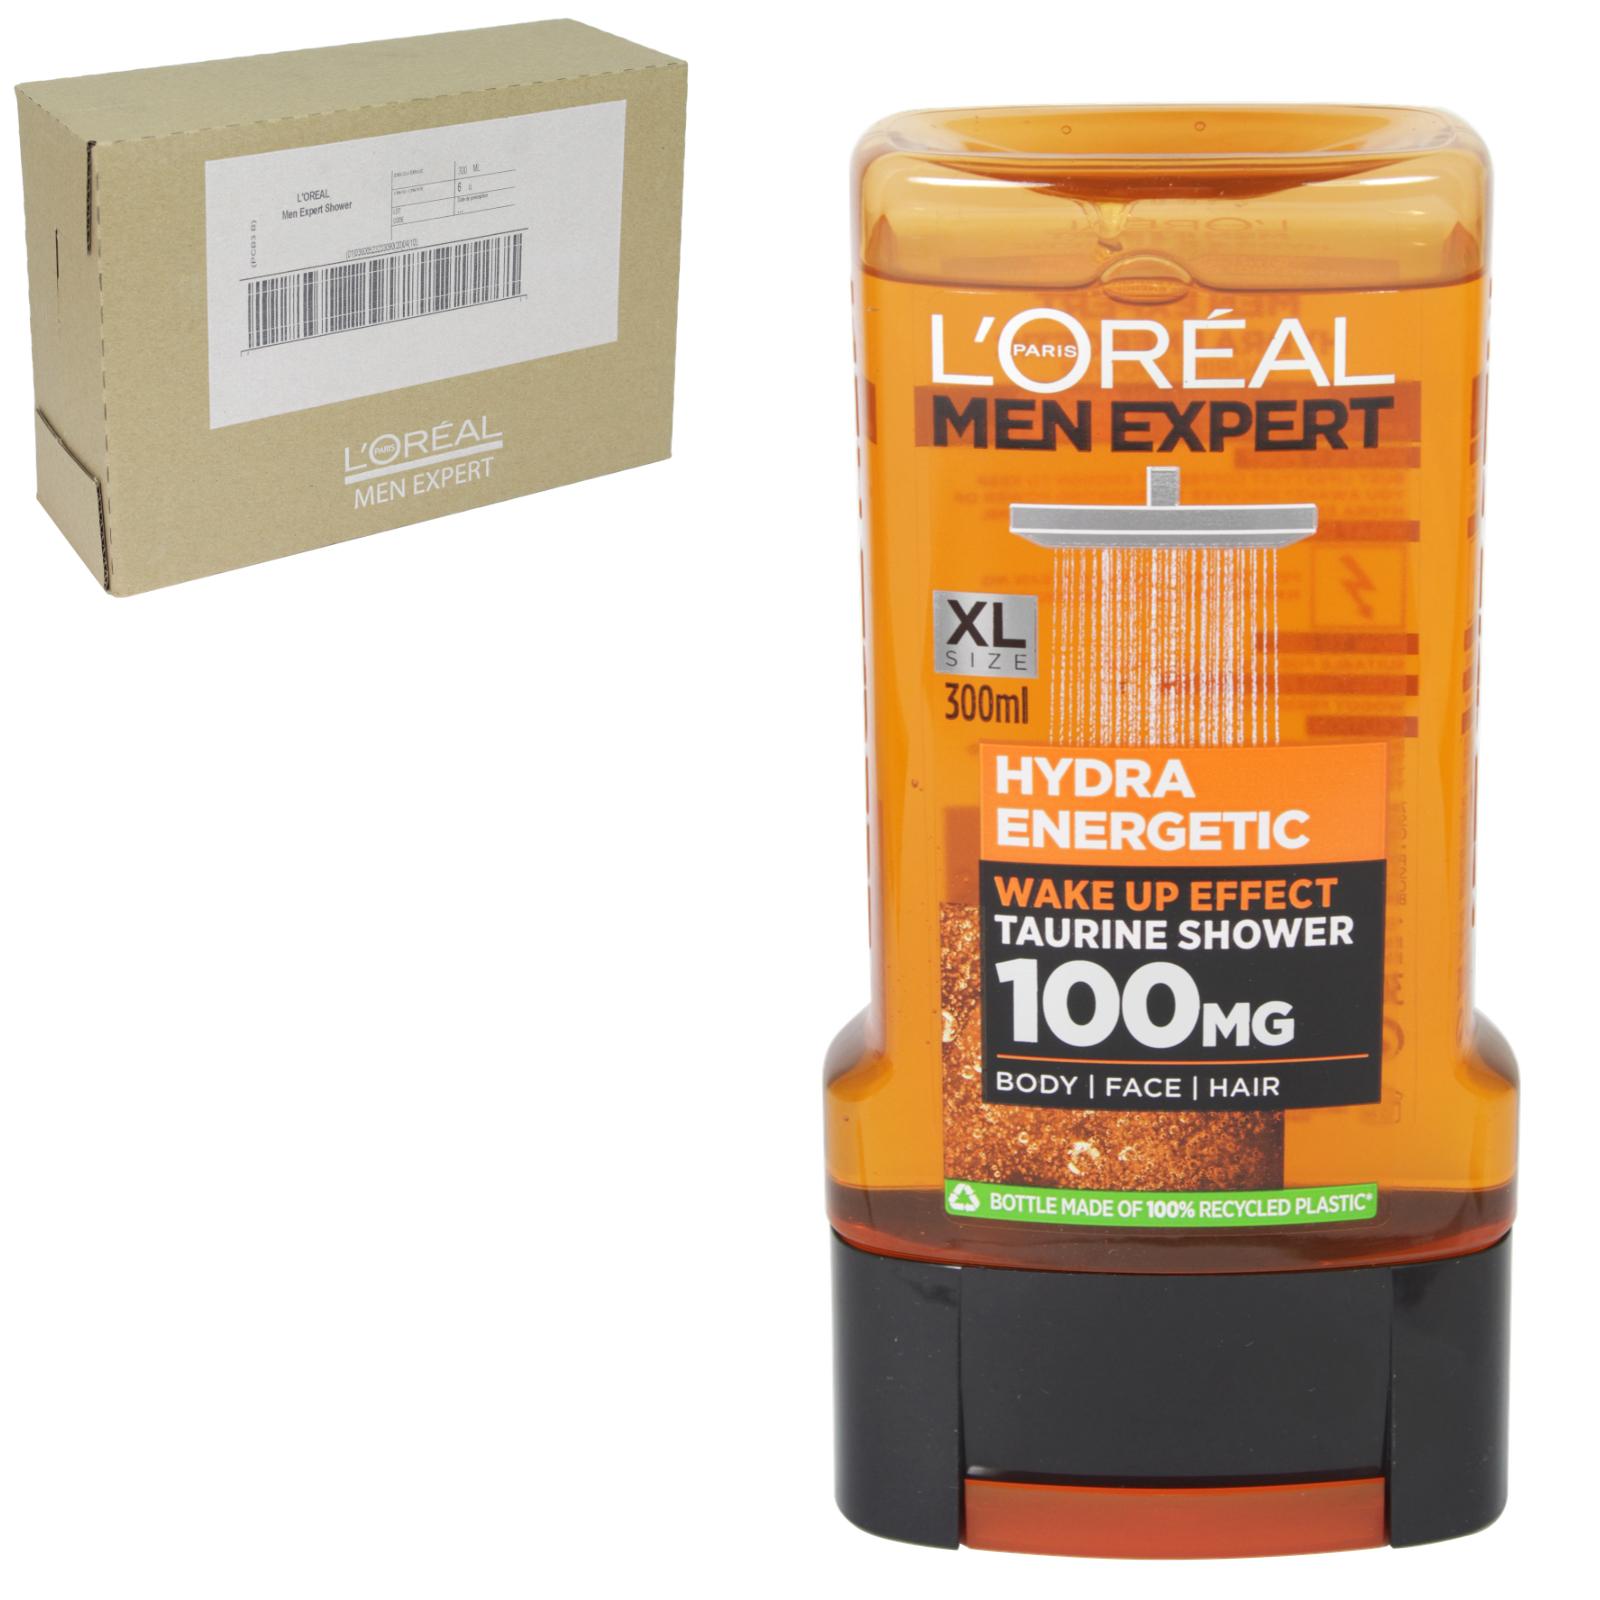 LOREAL MEN EXPERT SHOWER 300ML HYDRA ENERG X6